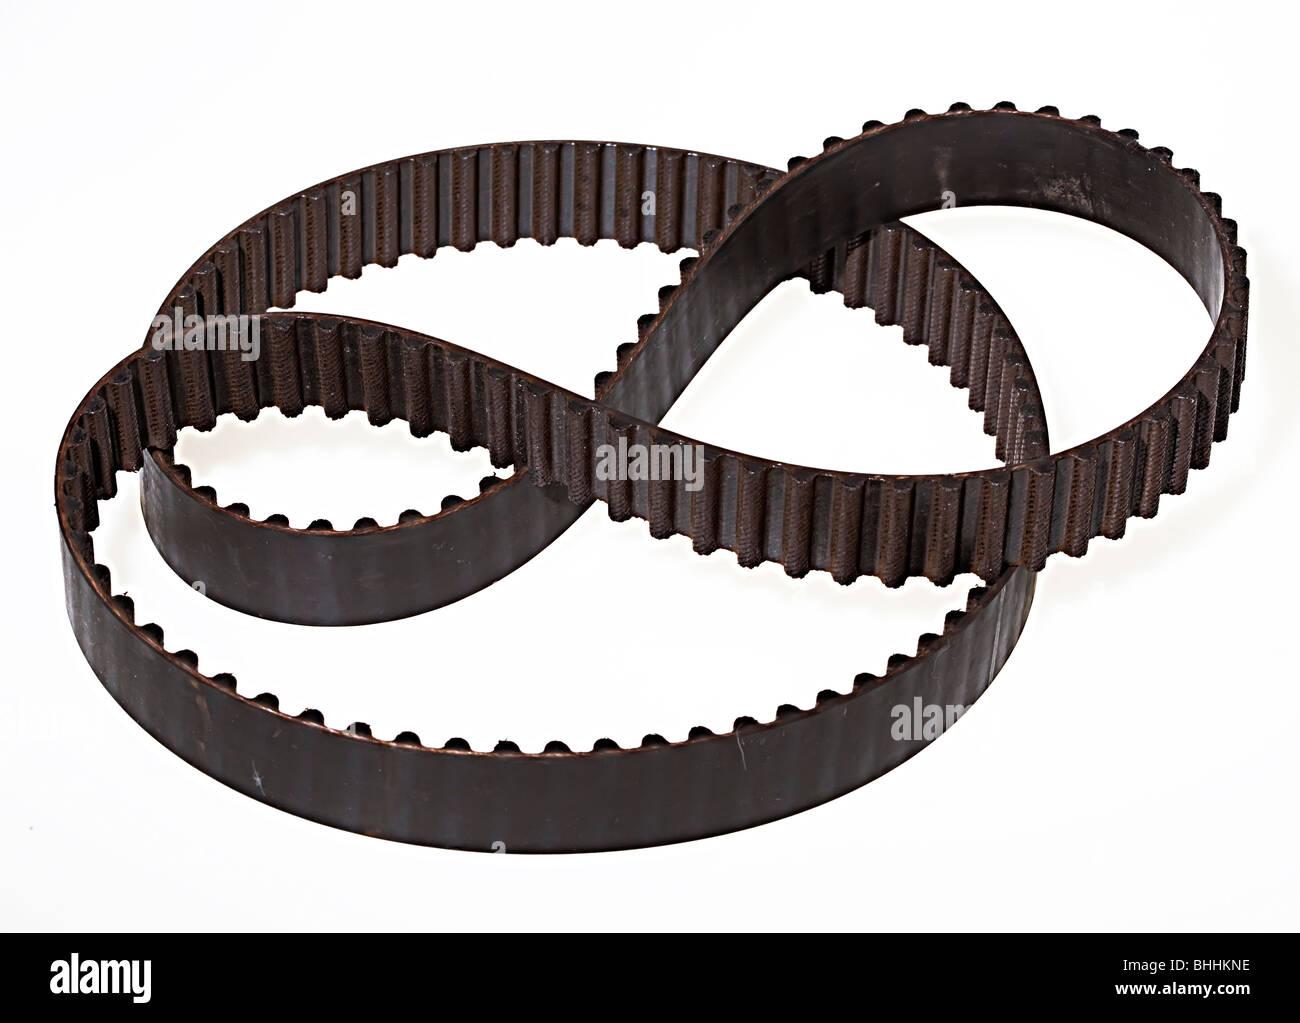 Used worn engine cam belt - Stock Image